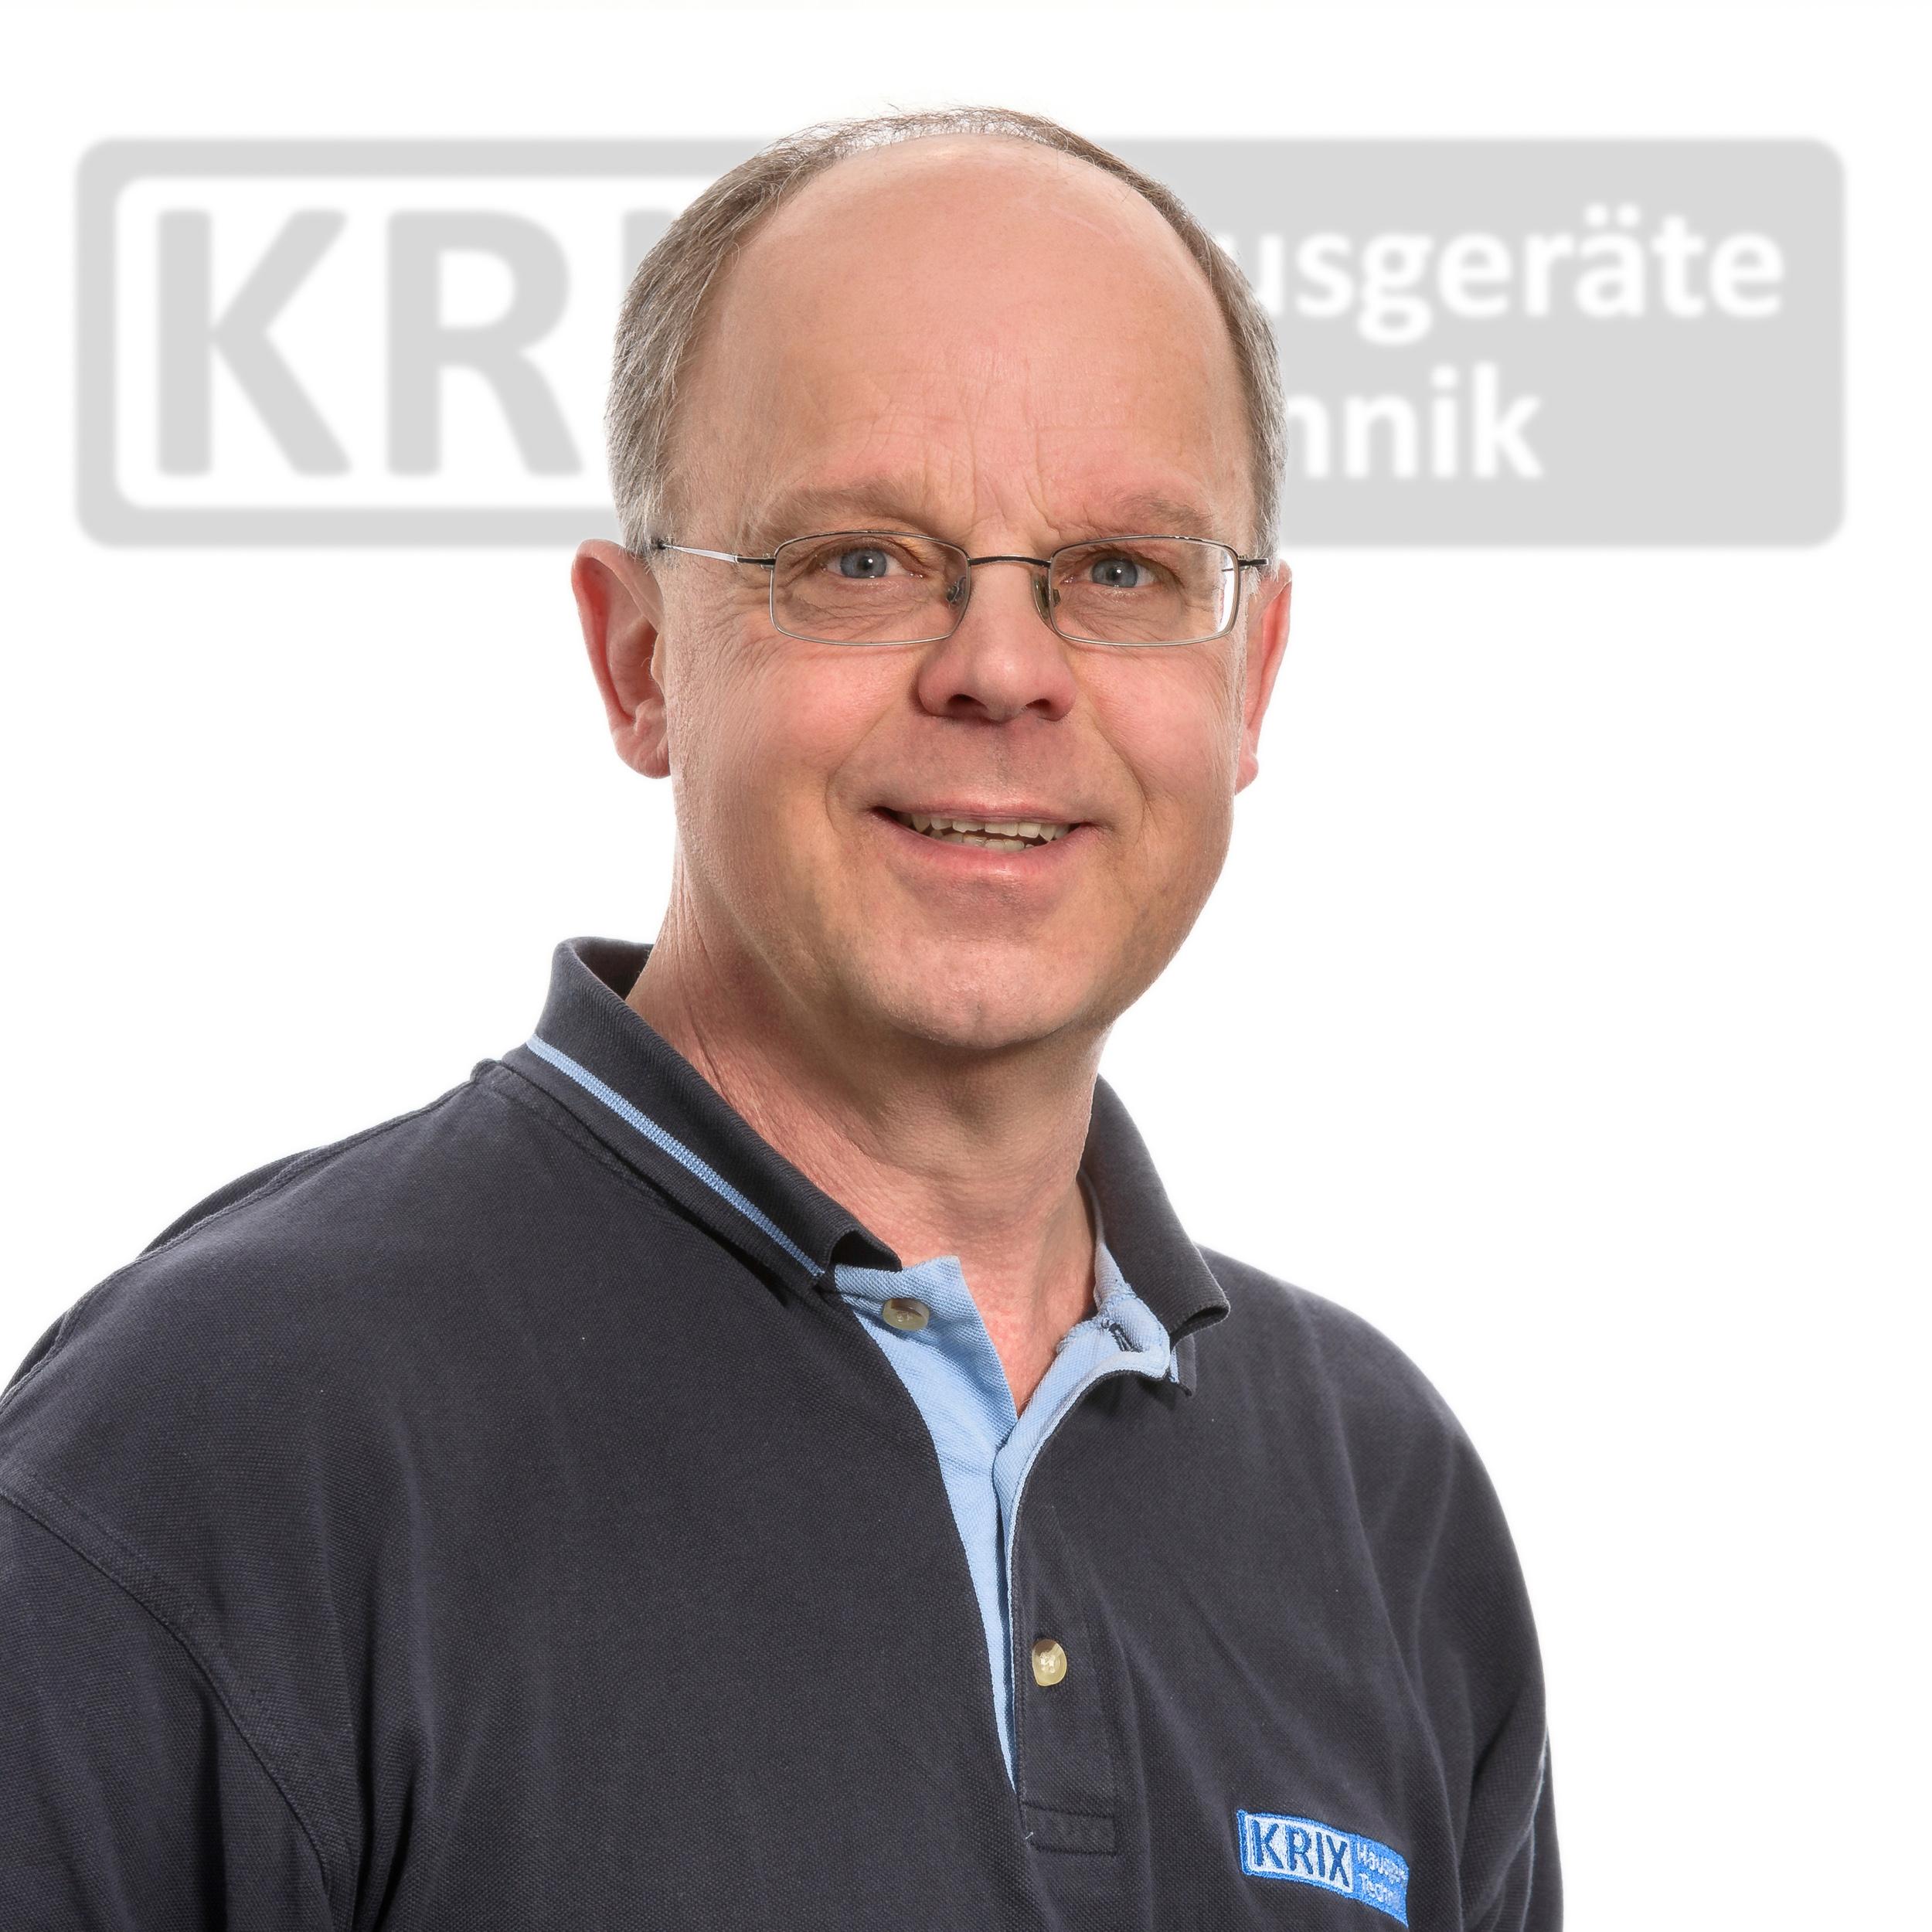 Reinhard Krix